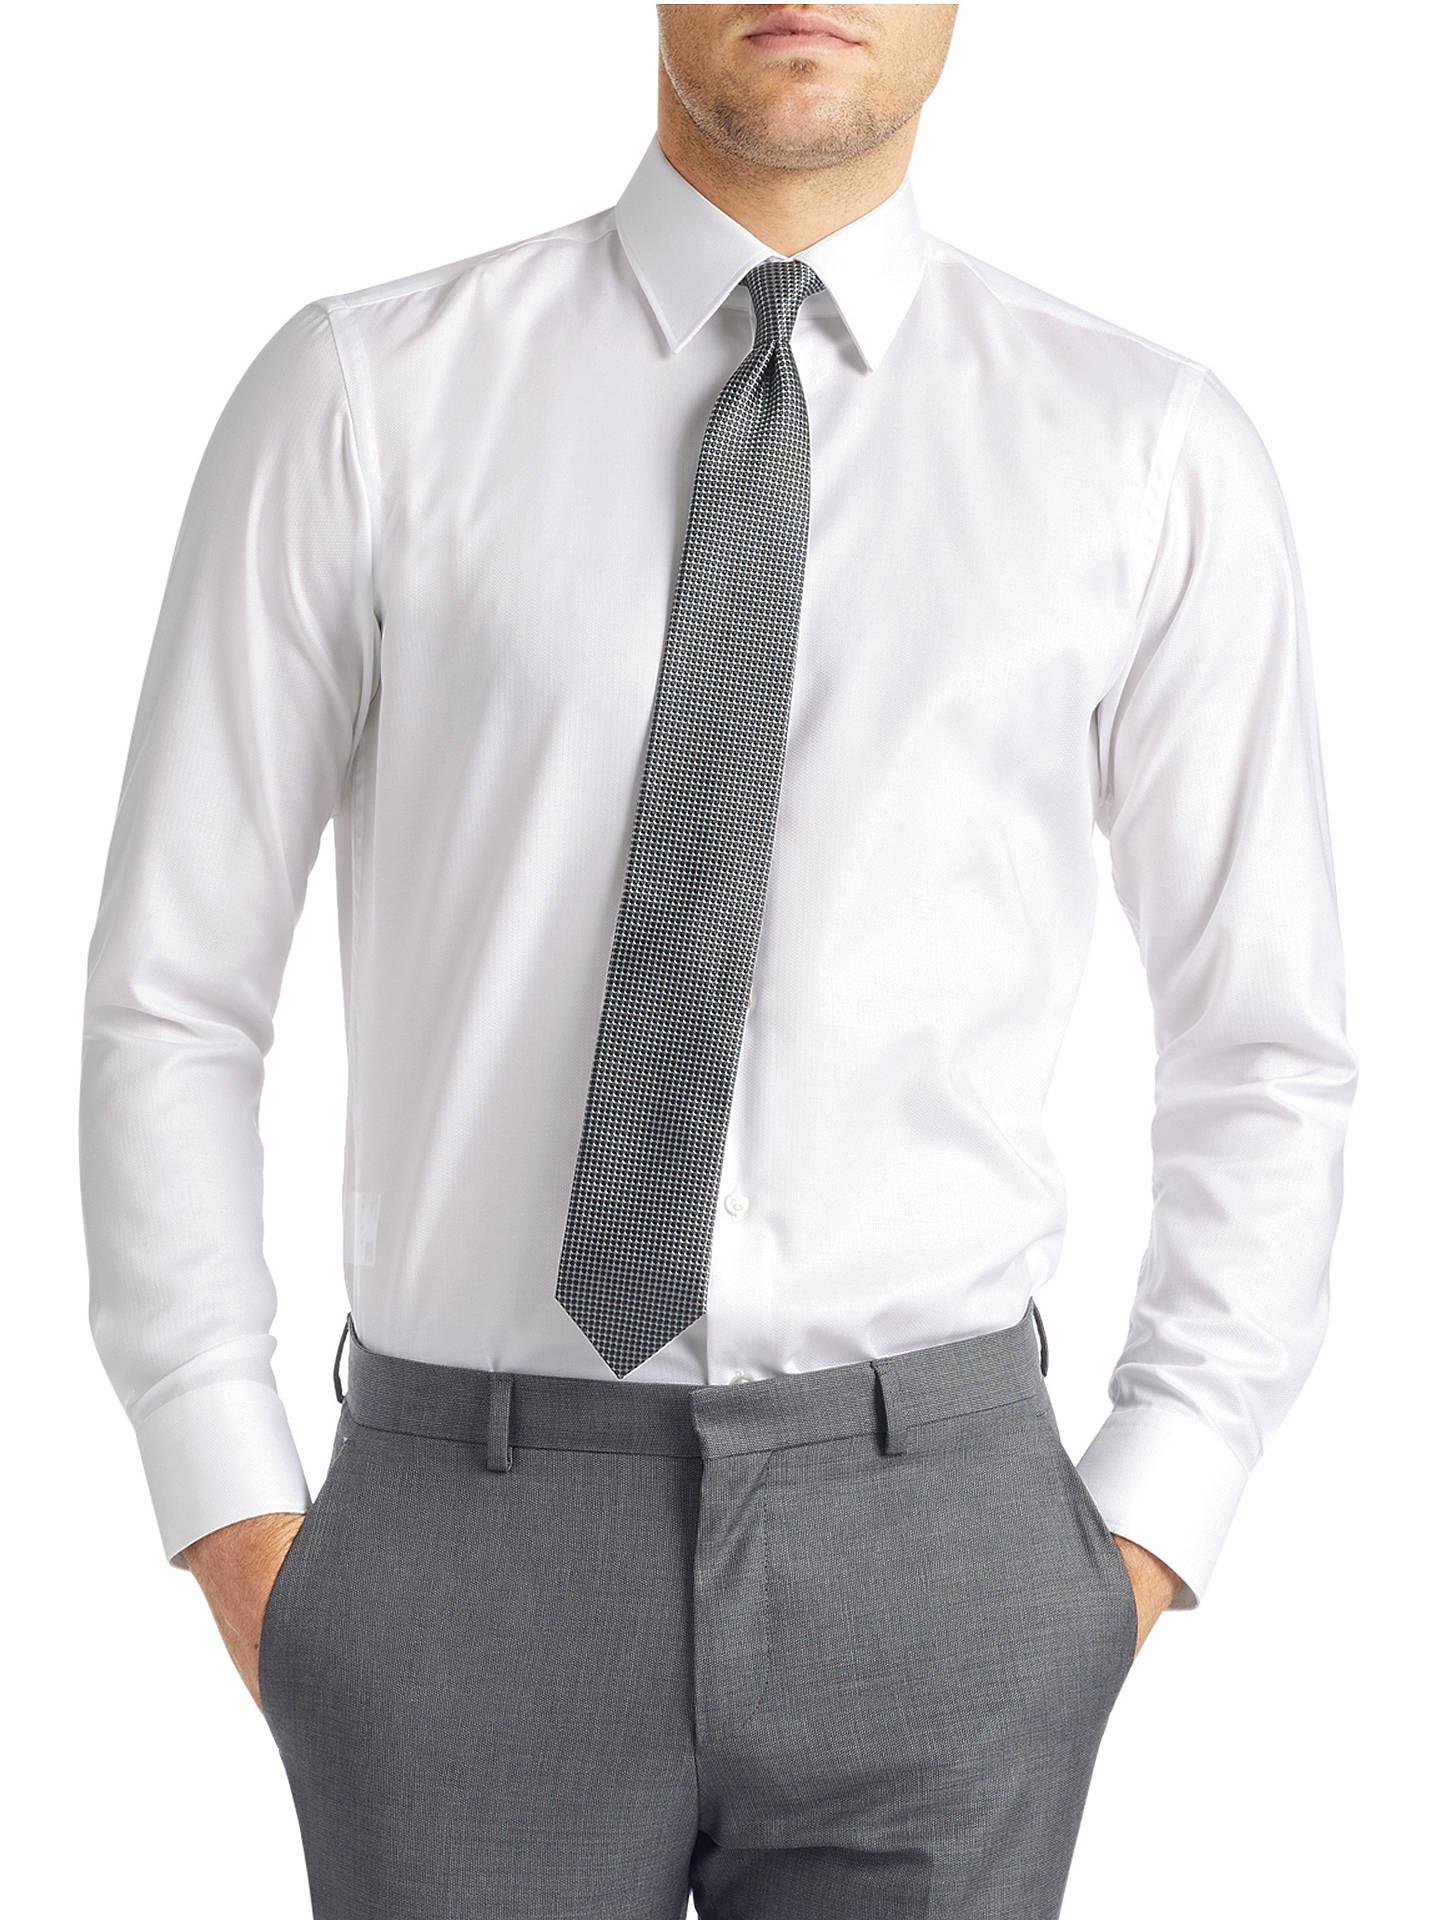 1b39fb8e3 HUGO by Hugo Boss C-Enzo Shirt, Open White at John Lewis & Partners